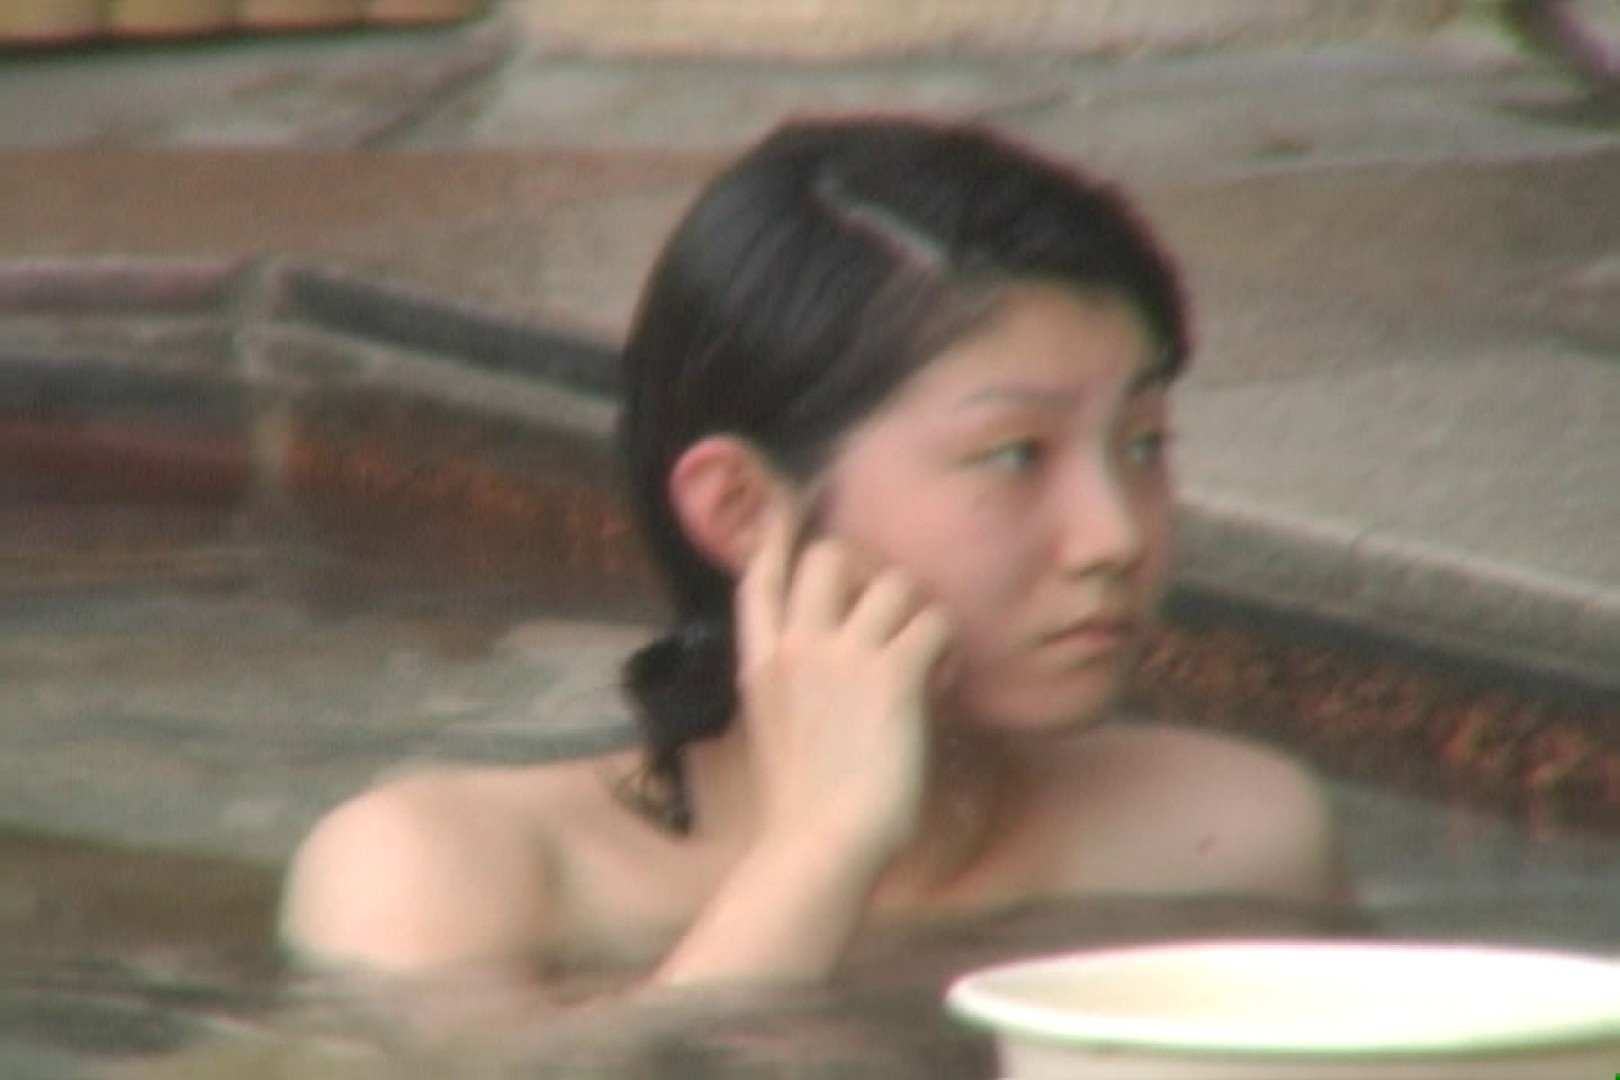 Aquaな露天風呂Vol.579 OL女体 | 露天  72連発 55